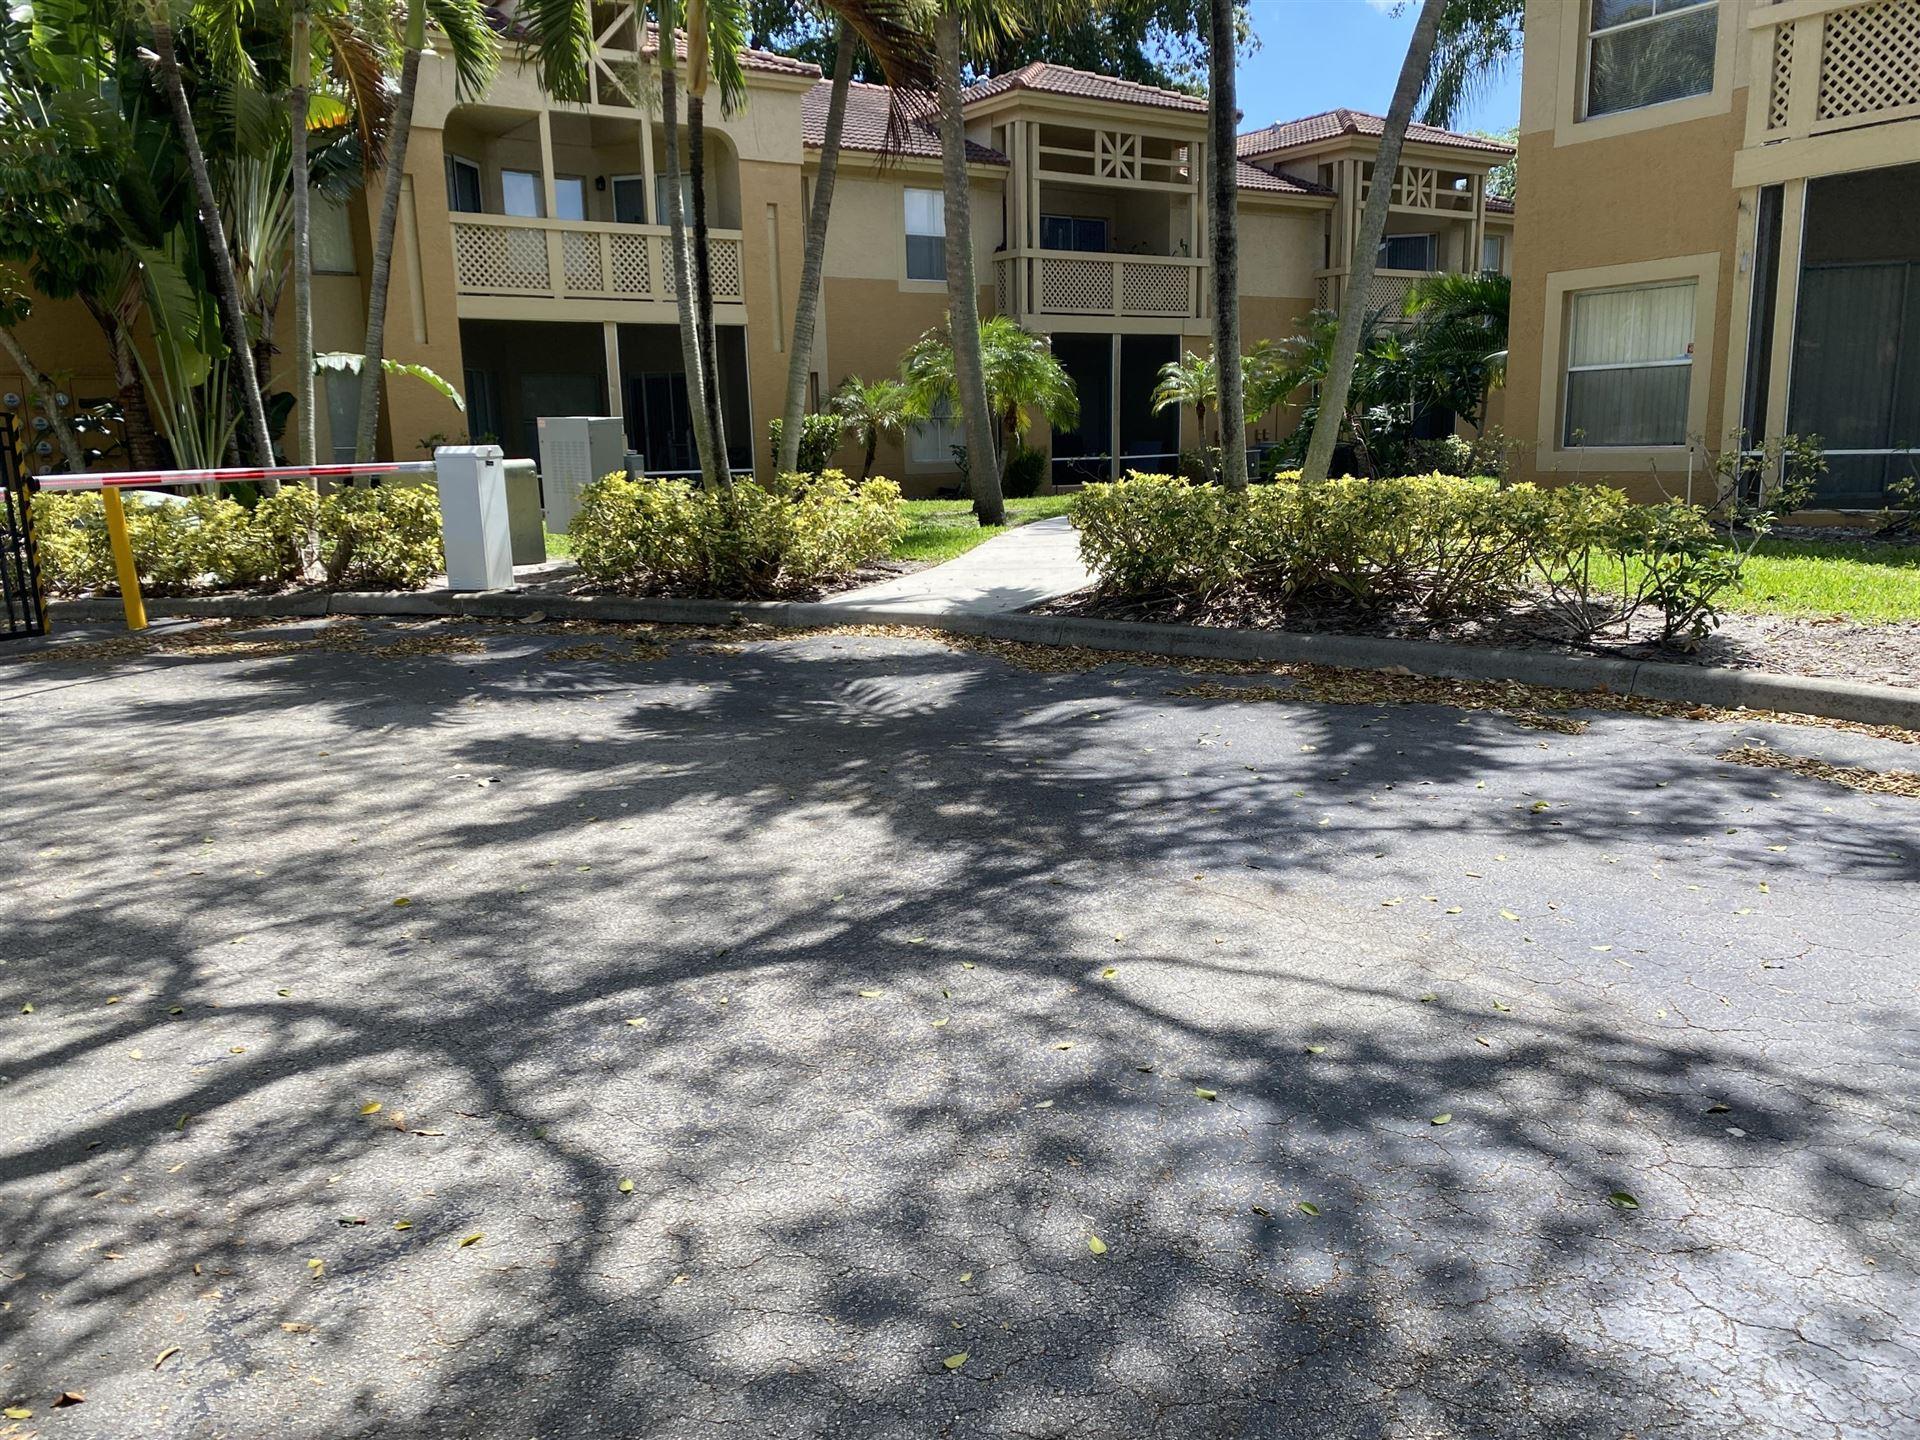 4767 Via Palm Lk #208, West Palm Beach, FL 33417 - MLS#: RX-10712474